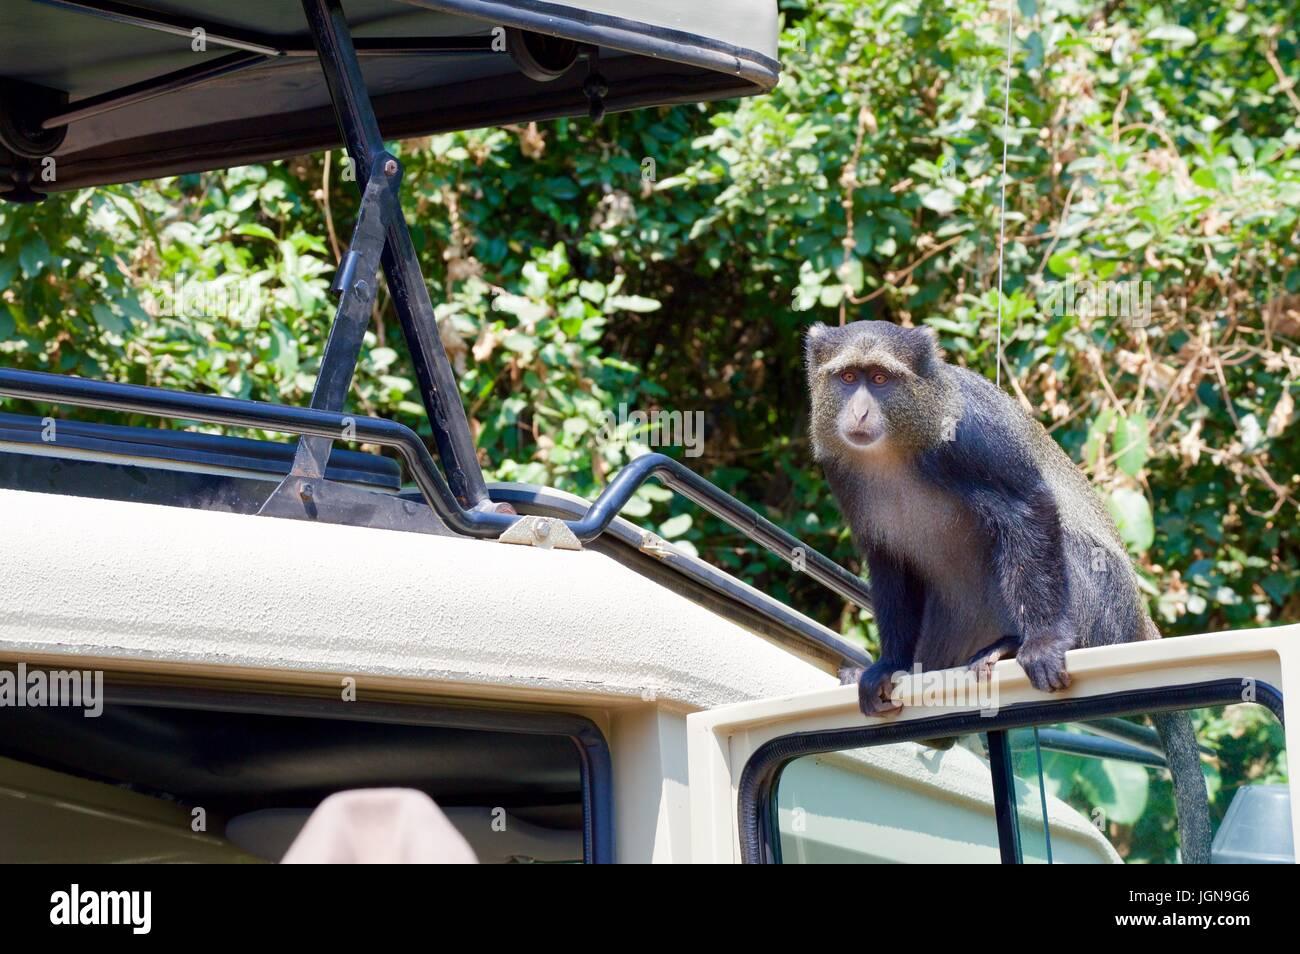 Blue Monkey on safari truck, Tanzania - Stock Image